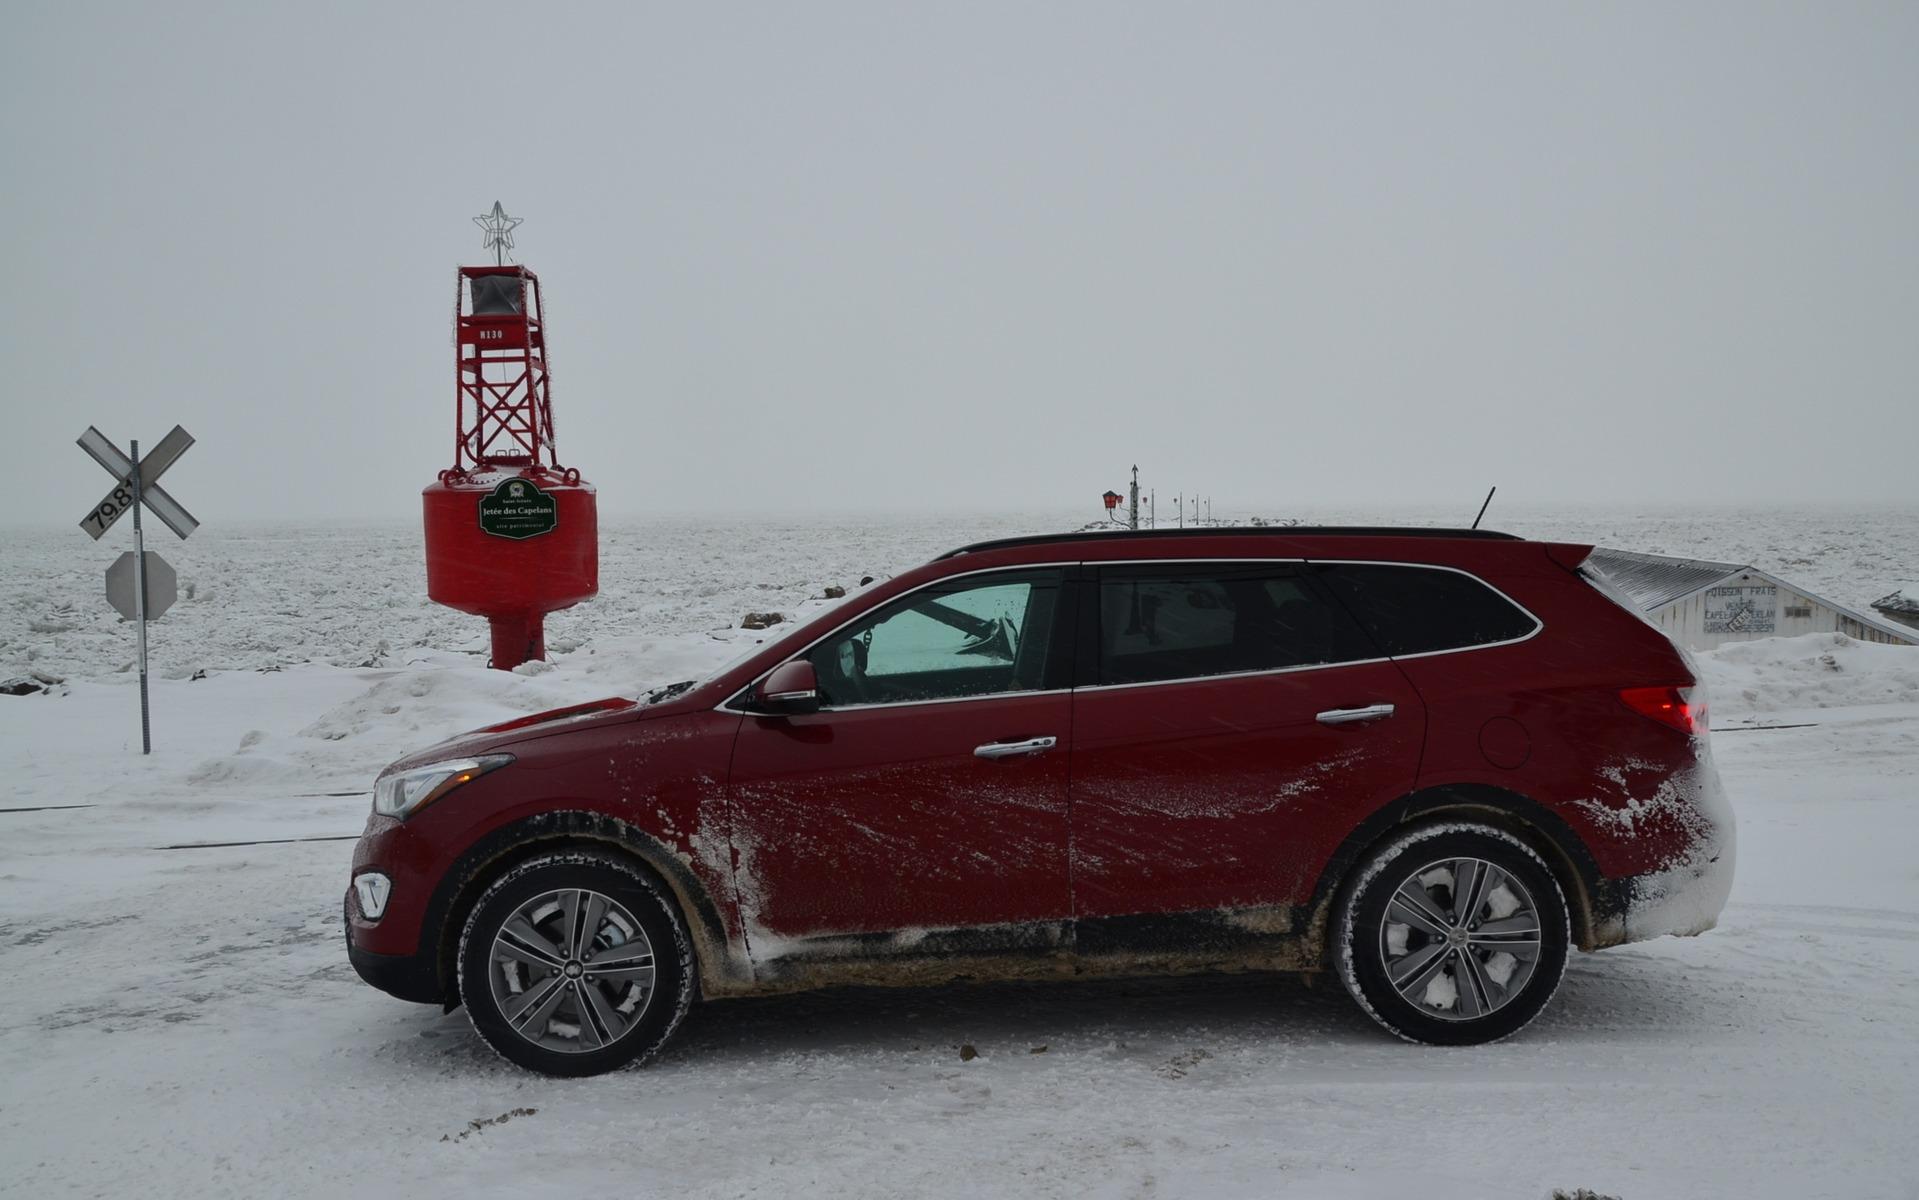 Hyundai Santa Fe 2015 >> 2015 Hyundai Santa Fe XL: A Test Drive In My (Snowy) Backyard - 14/15